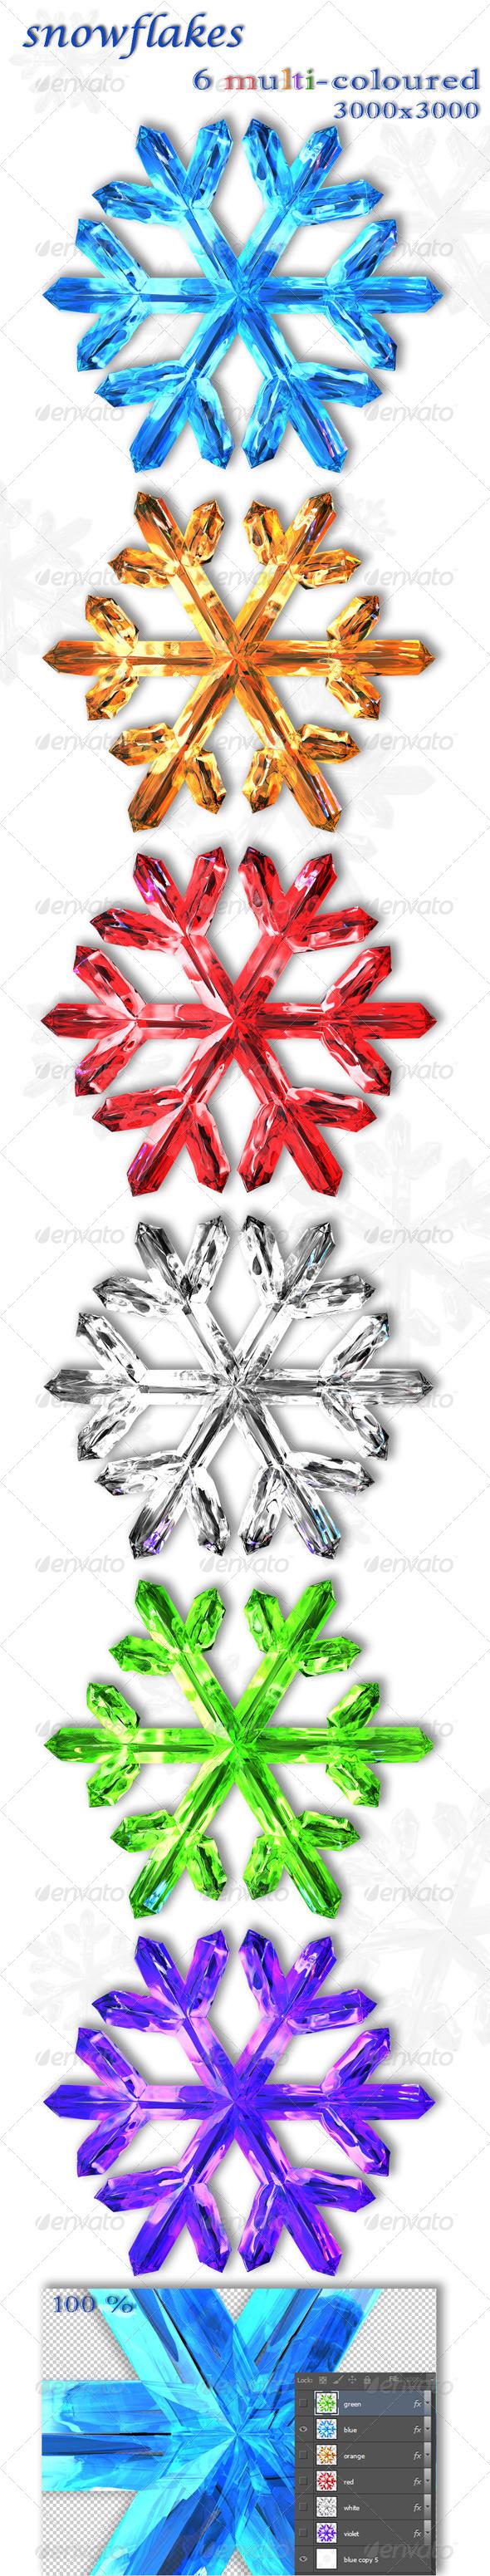 GraphicRiver Snowflakes 5566261